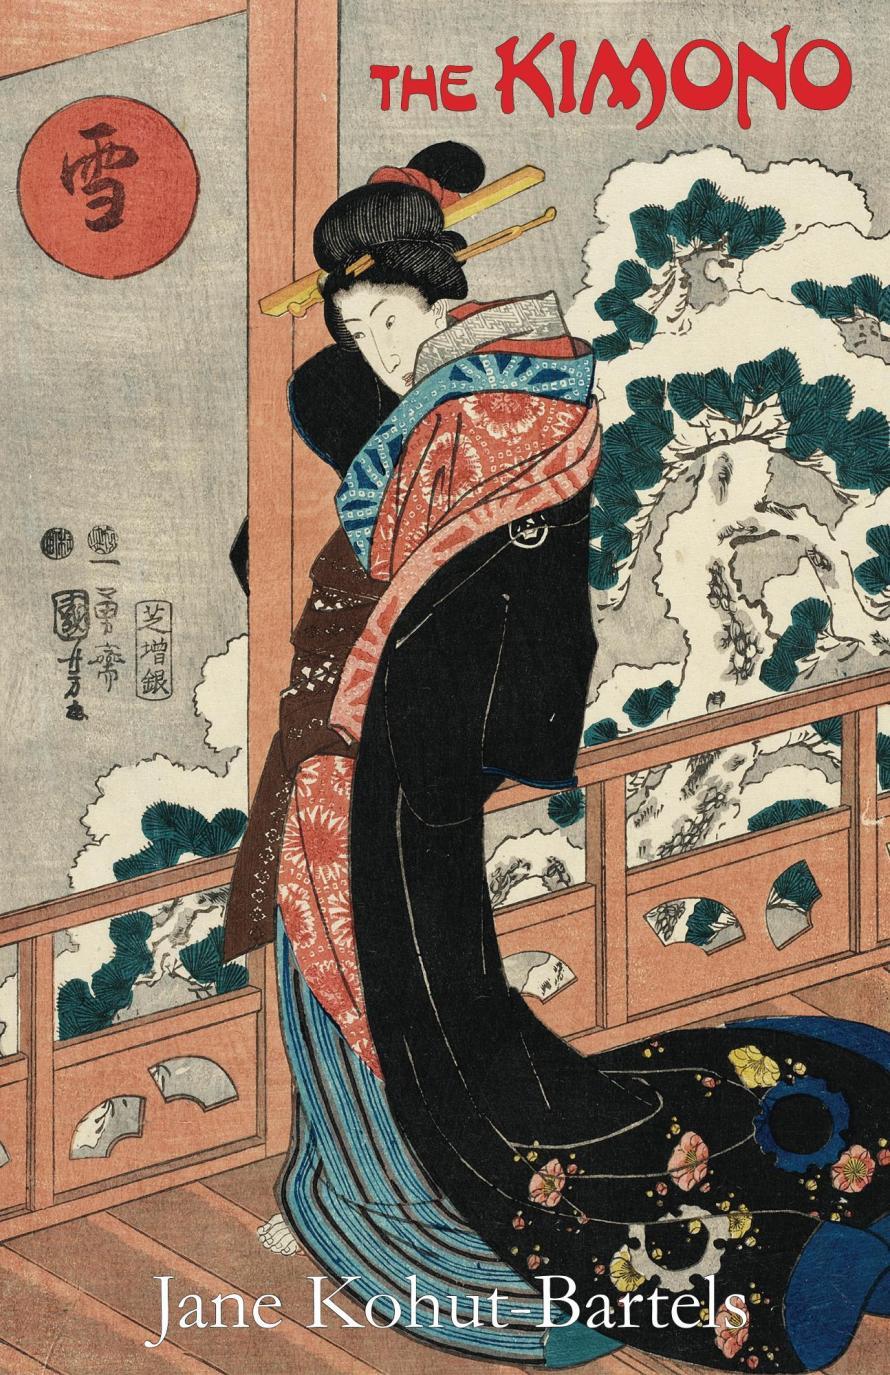 The_Kimono_Cover_for_blog_use.jpg